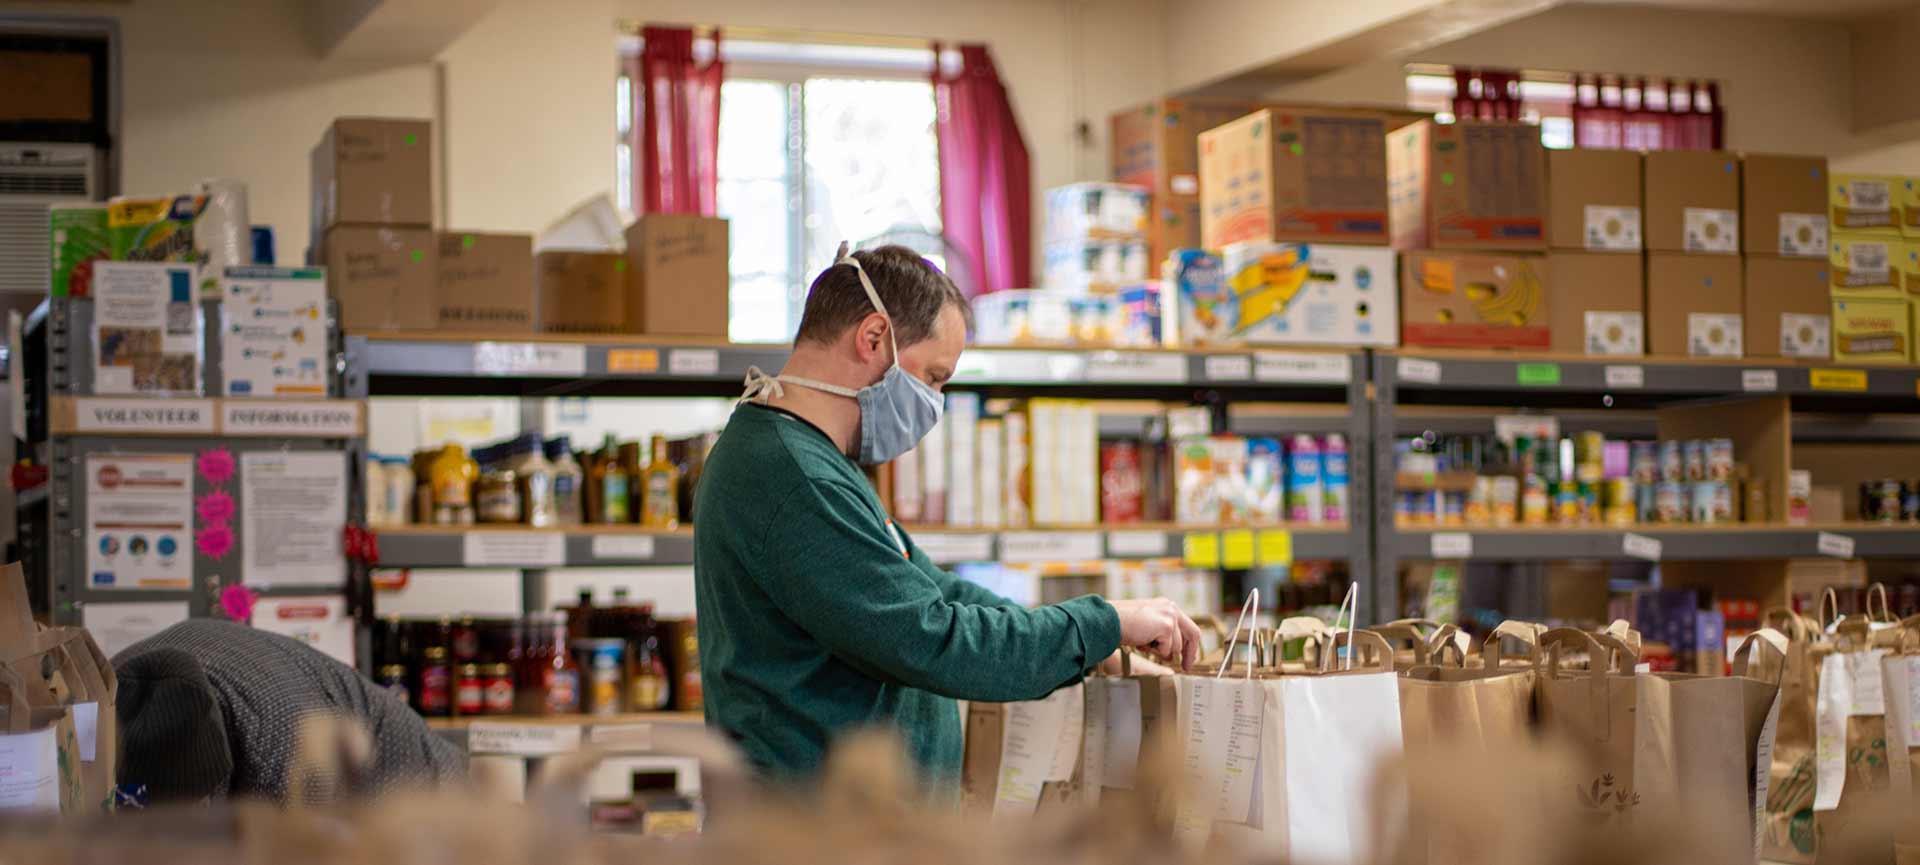 Man volunteering at food bank